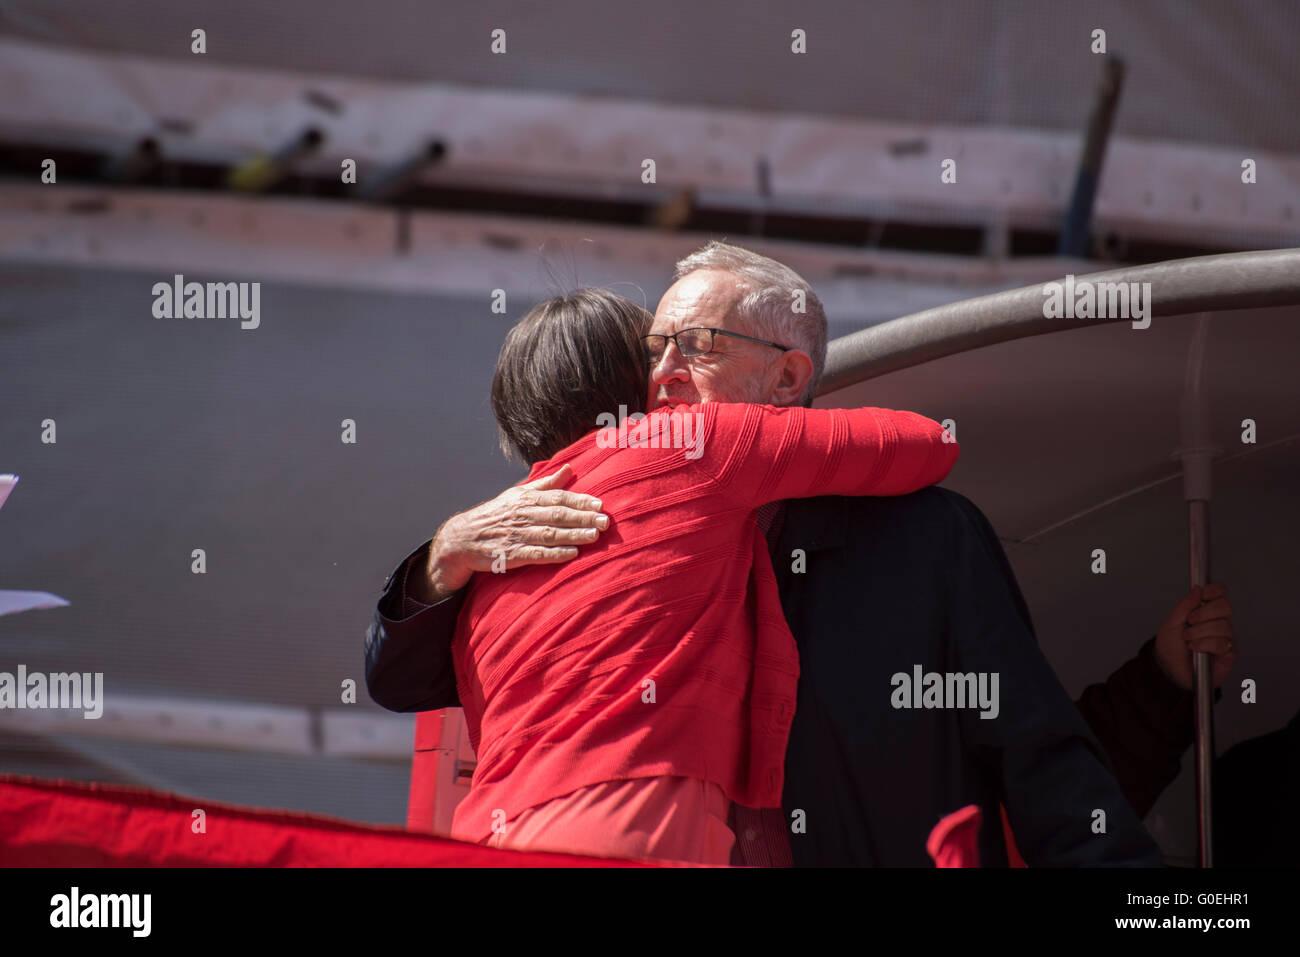 London, United KIngdom. 1st May 2016. Jeremy Bernard Corbyn the Leader of the Labour Party hugs Frances O'Grady - Stock Image